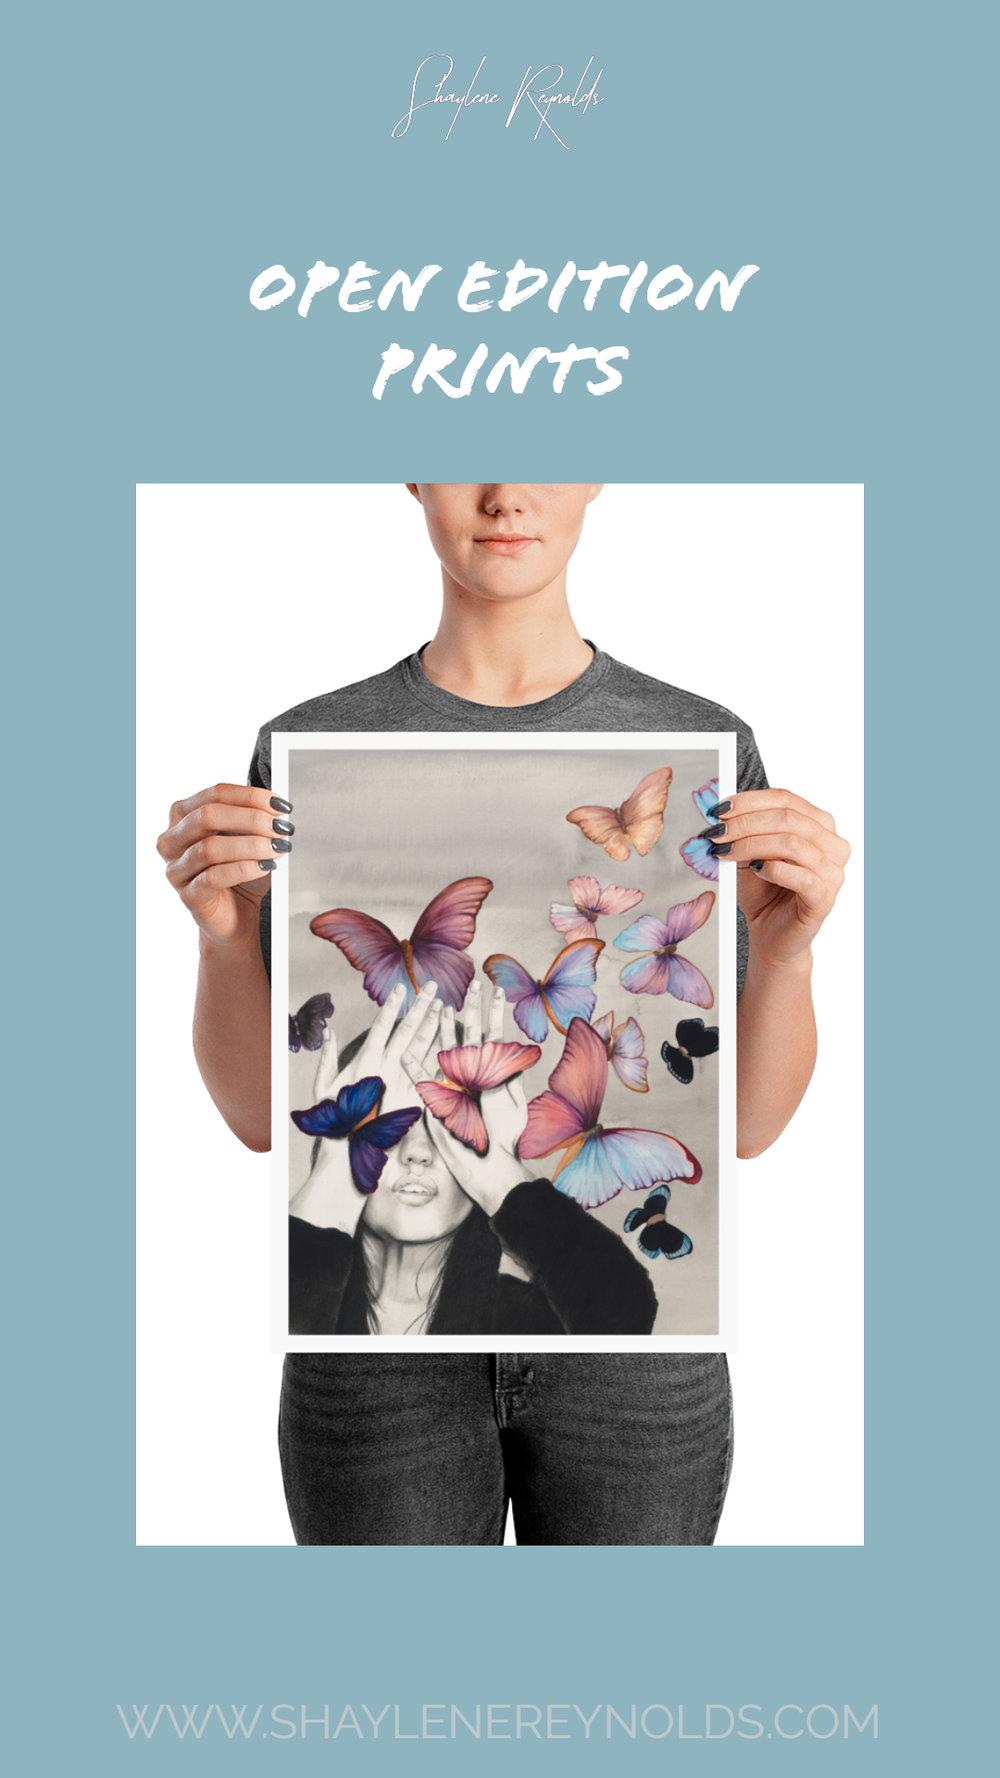 open edition prints.jpg